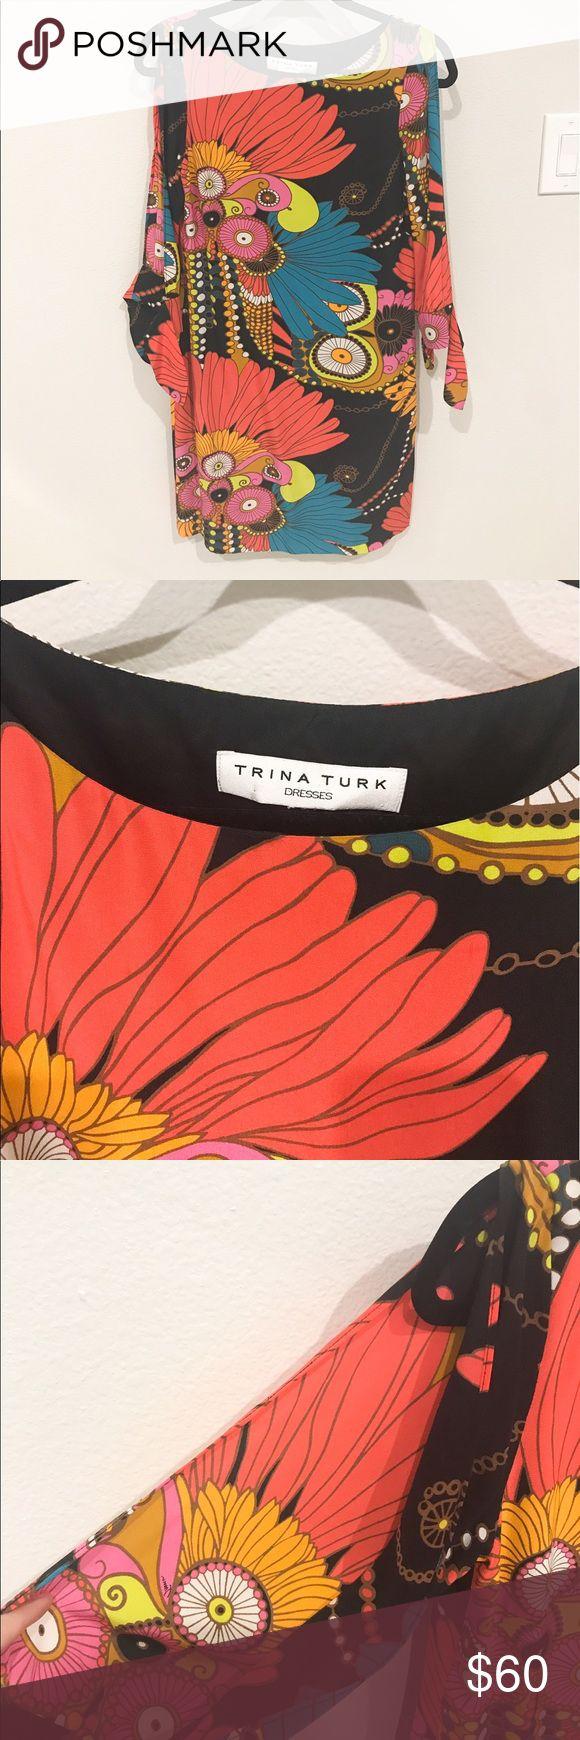 Colorful Trina Turk dress size 0 Vibrant Trina Turk silk dress with 3/4 split sleeves.  Like new, worn only a couple times. Trina Turk Dresses